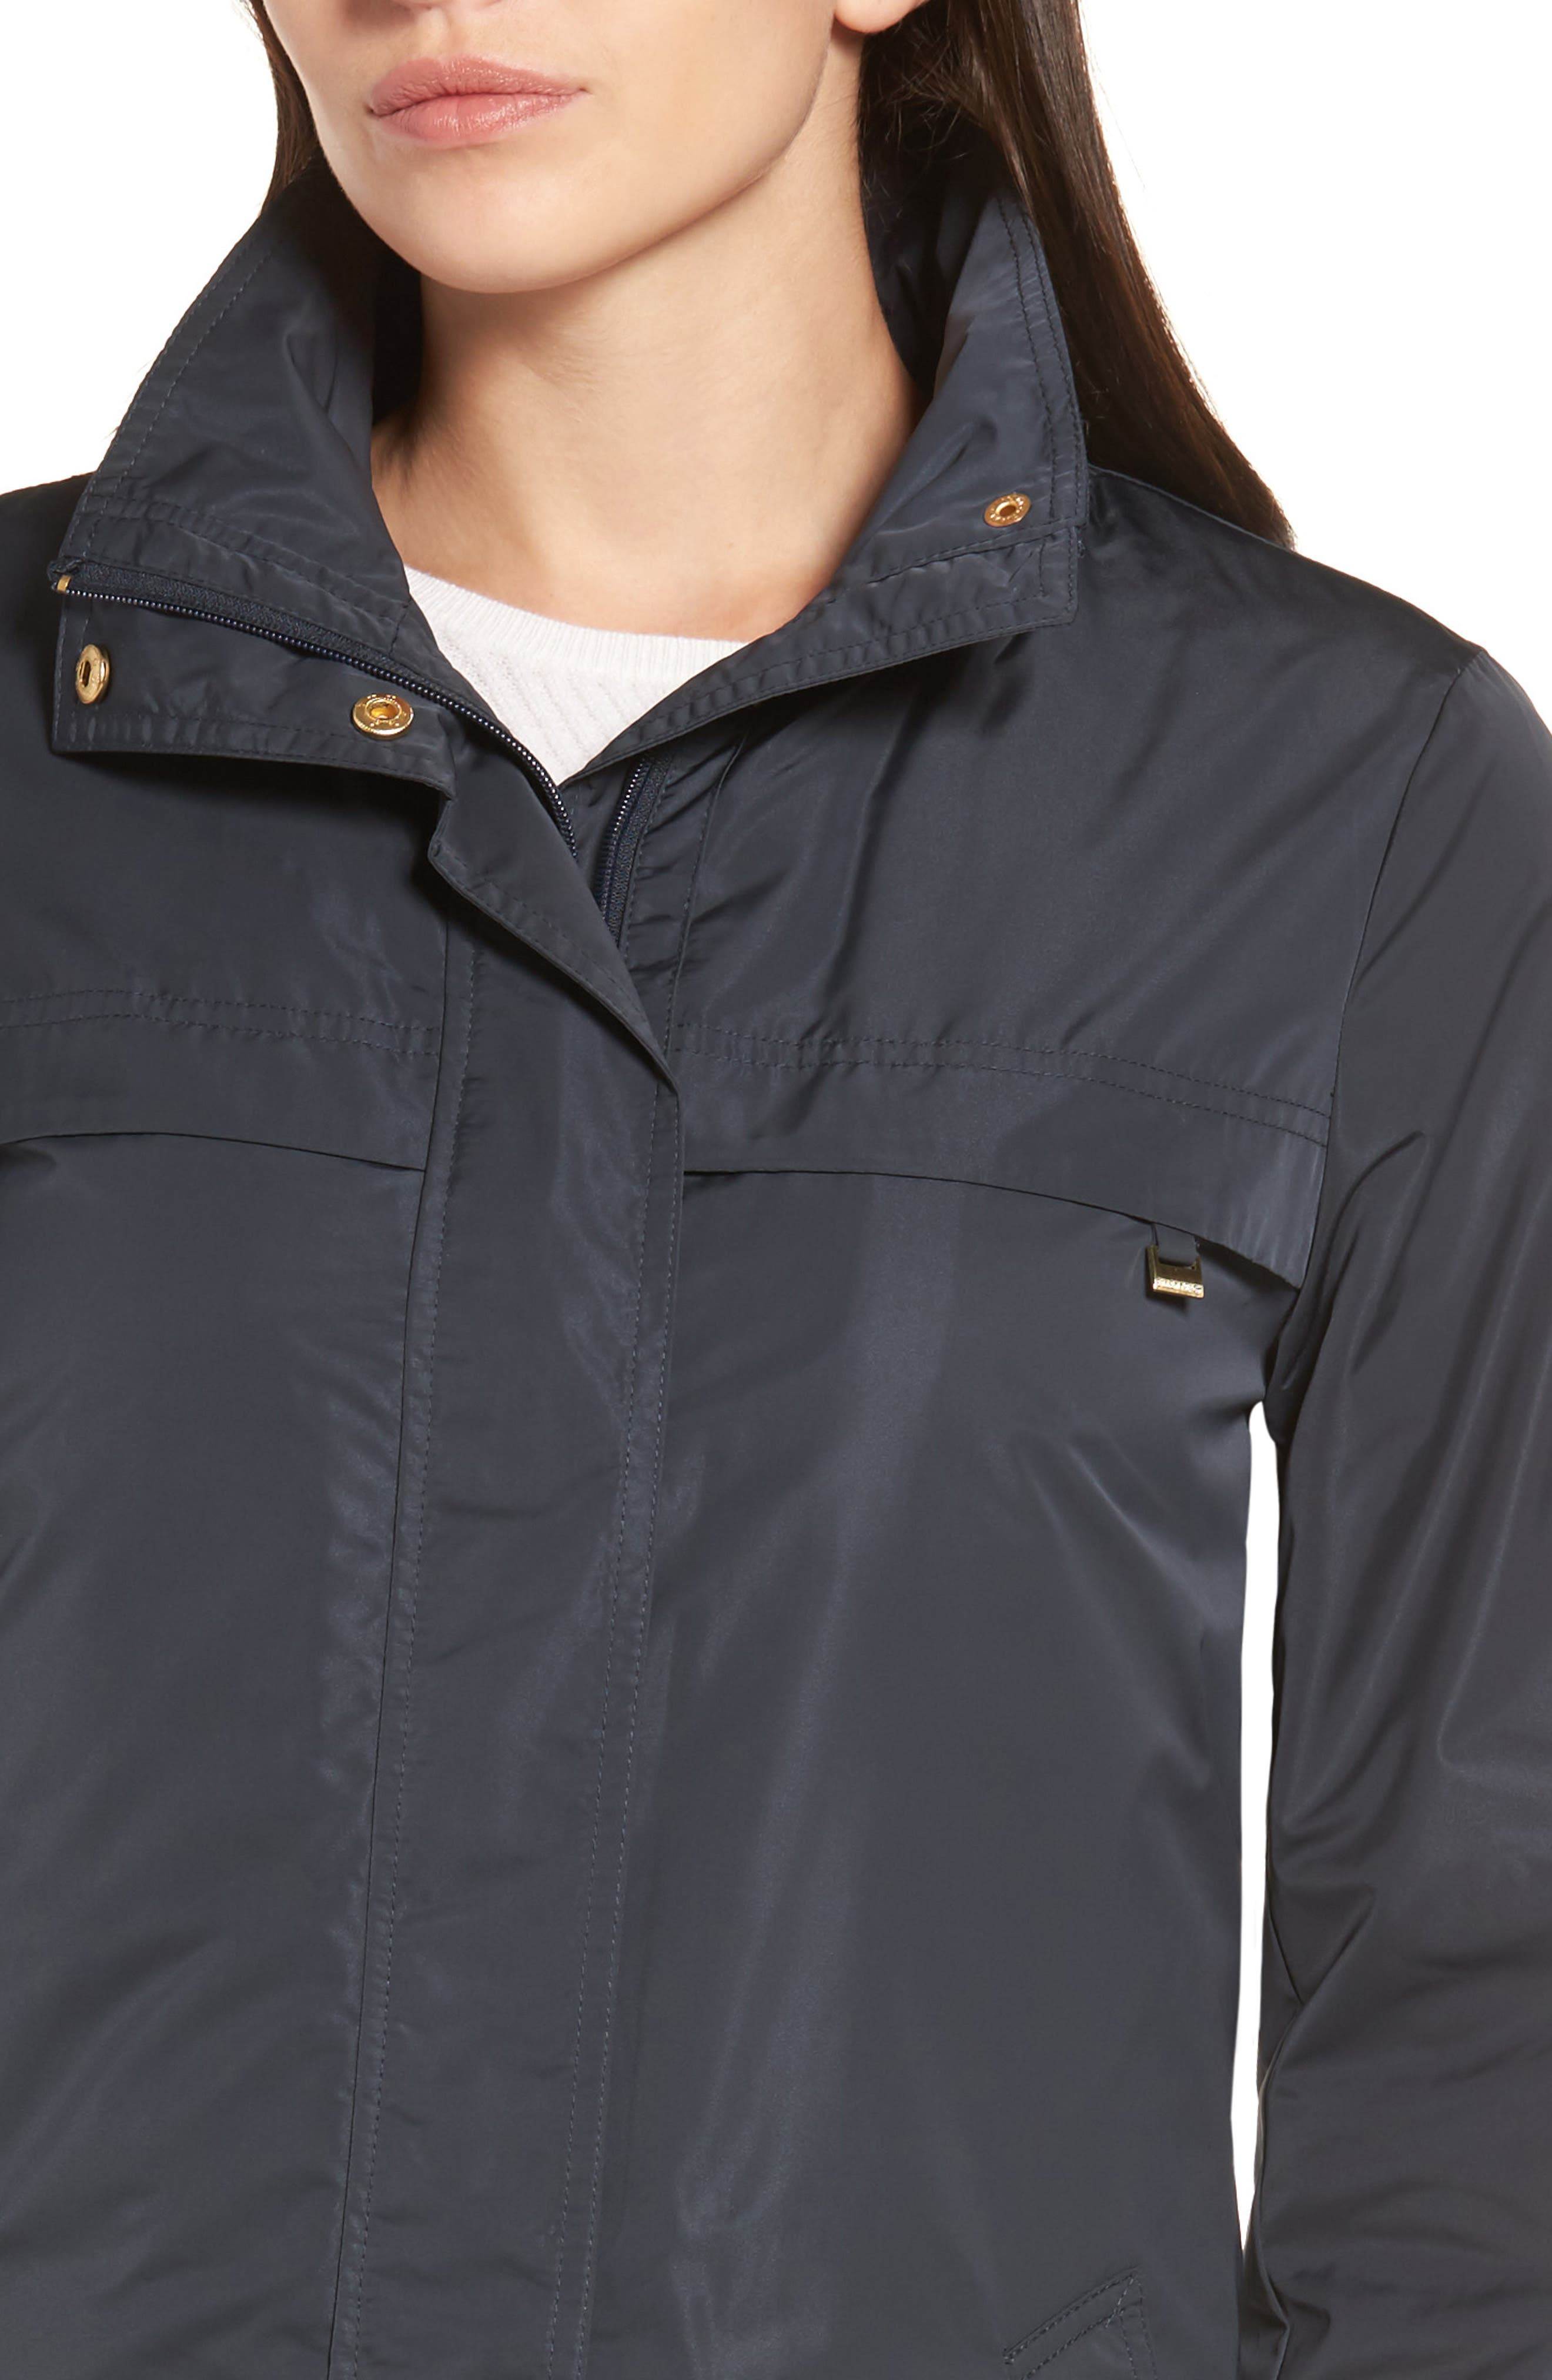 Raincoat with Detachable Hood,                             Alternate thumbnail 4, color,                             Navy